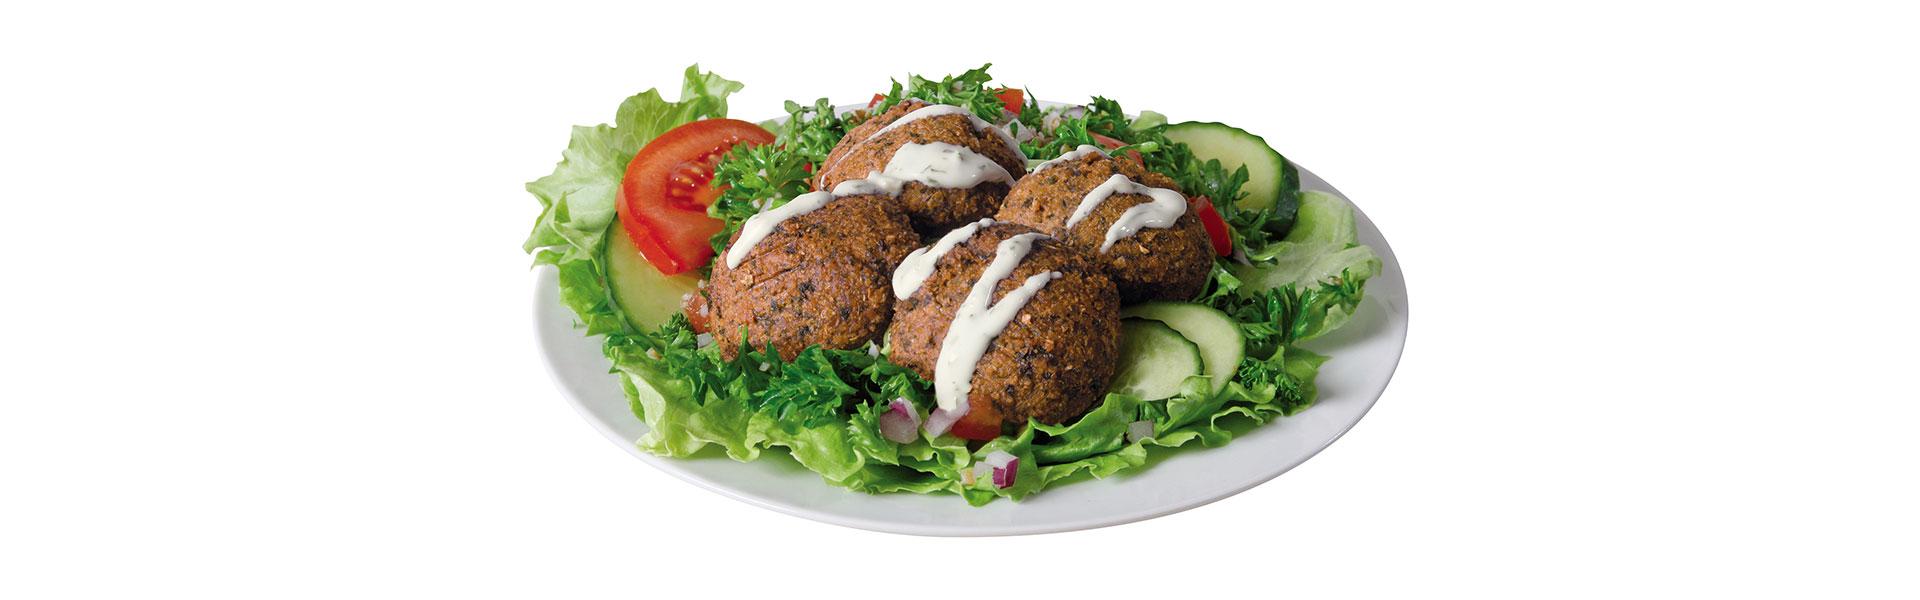 Catering B Falafel En